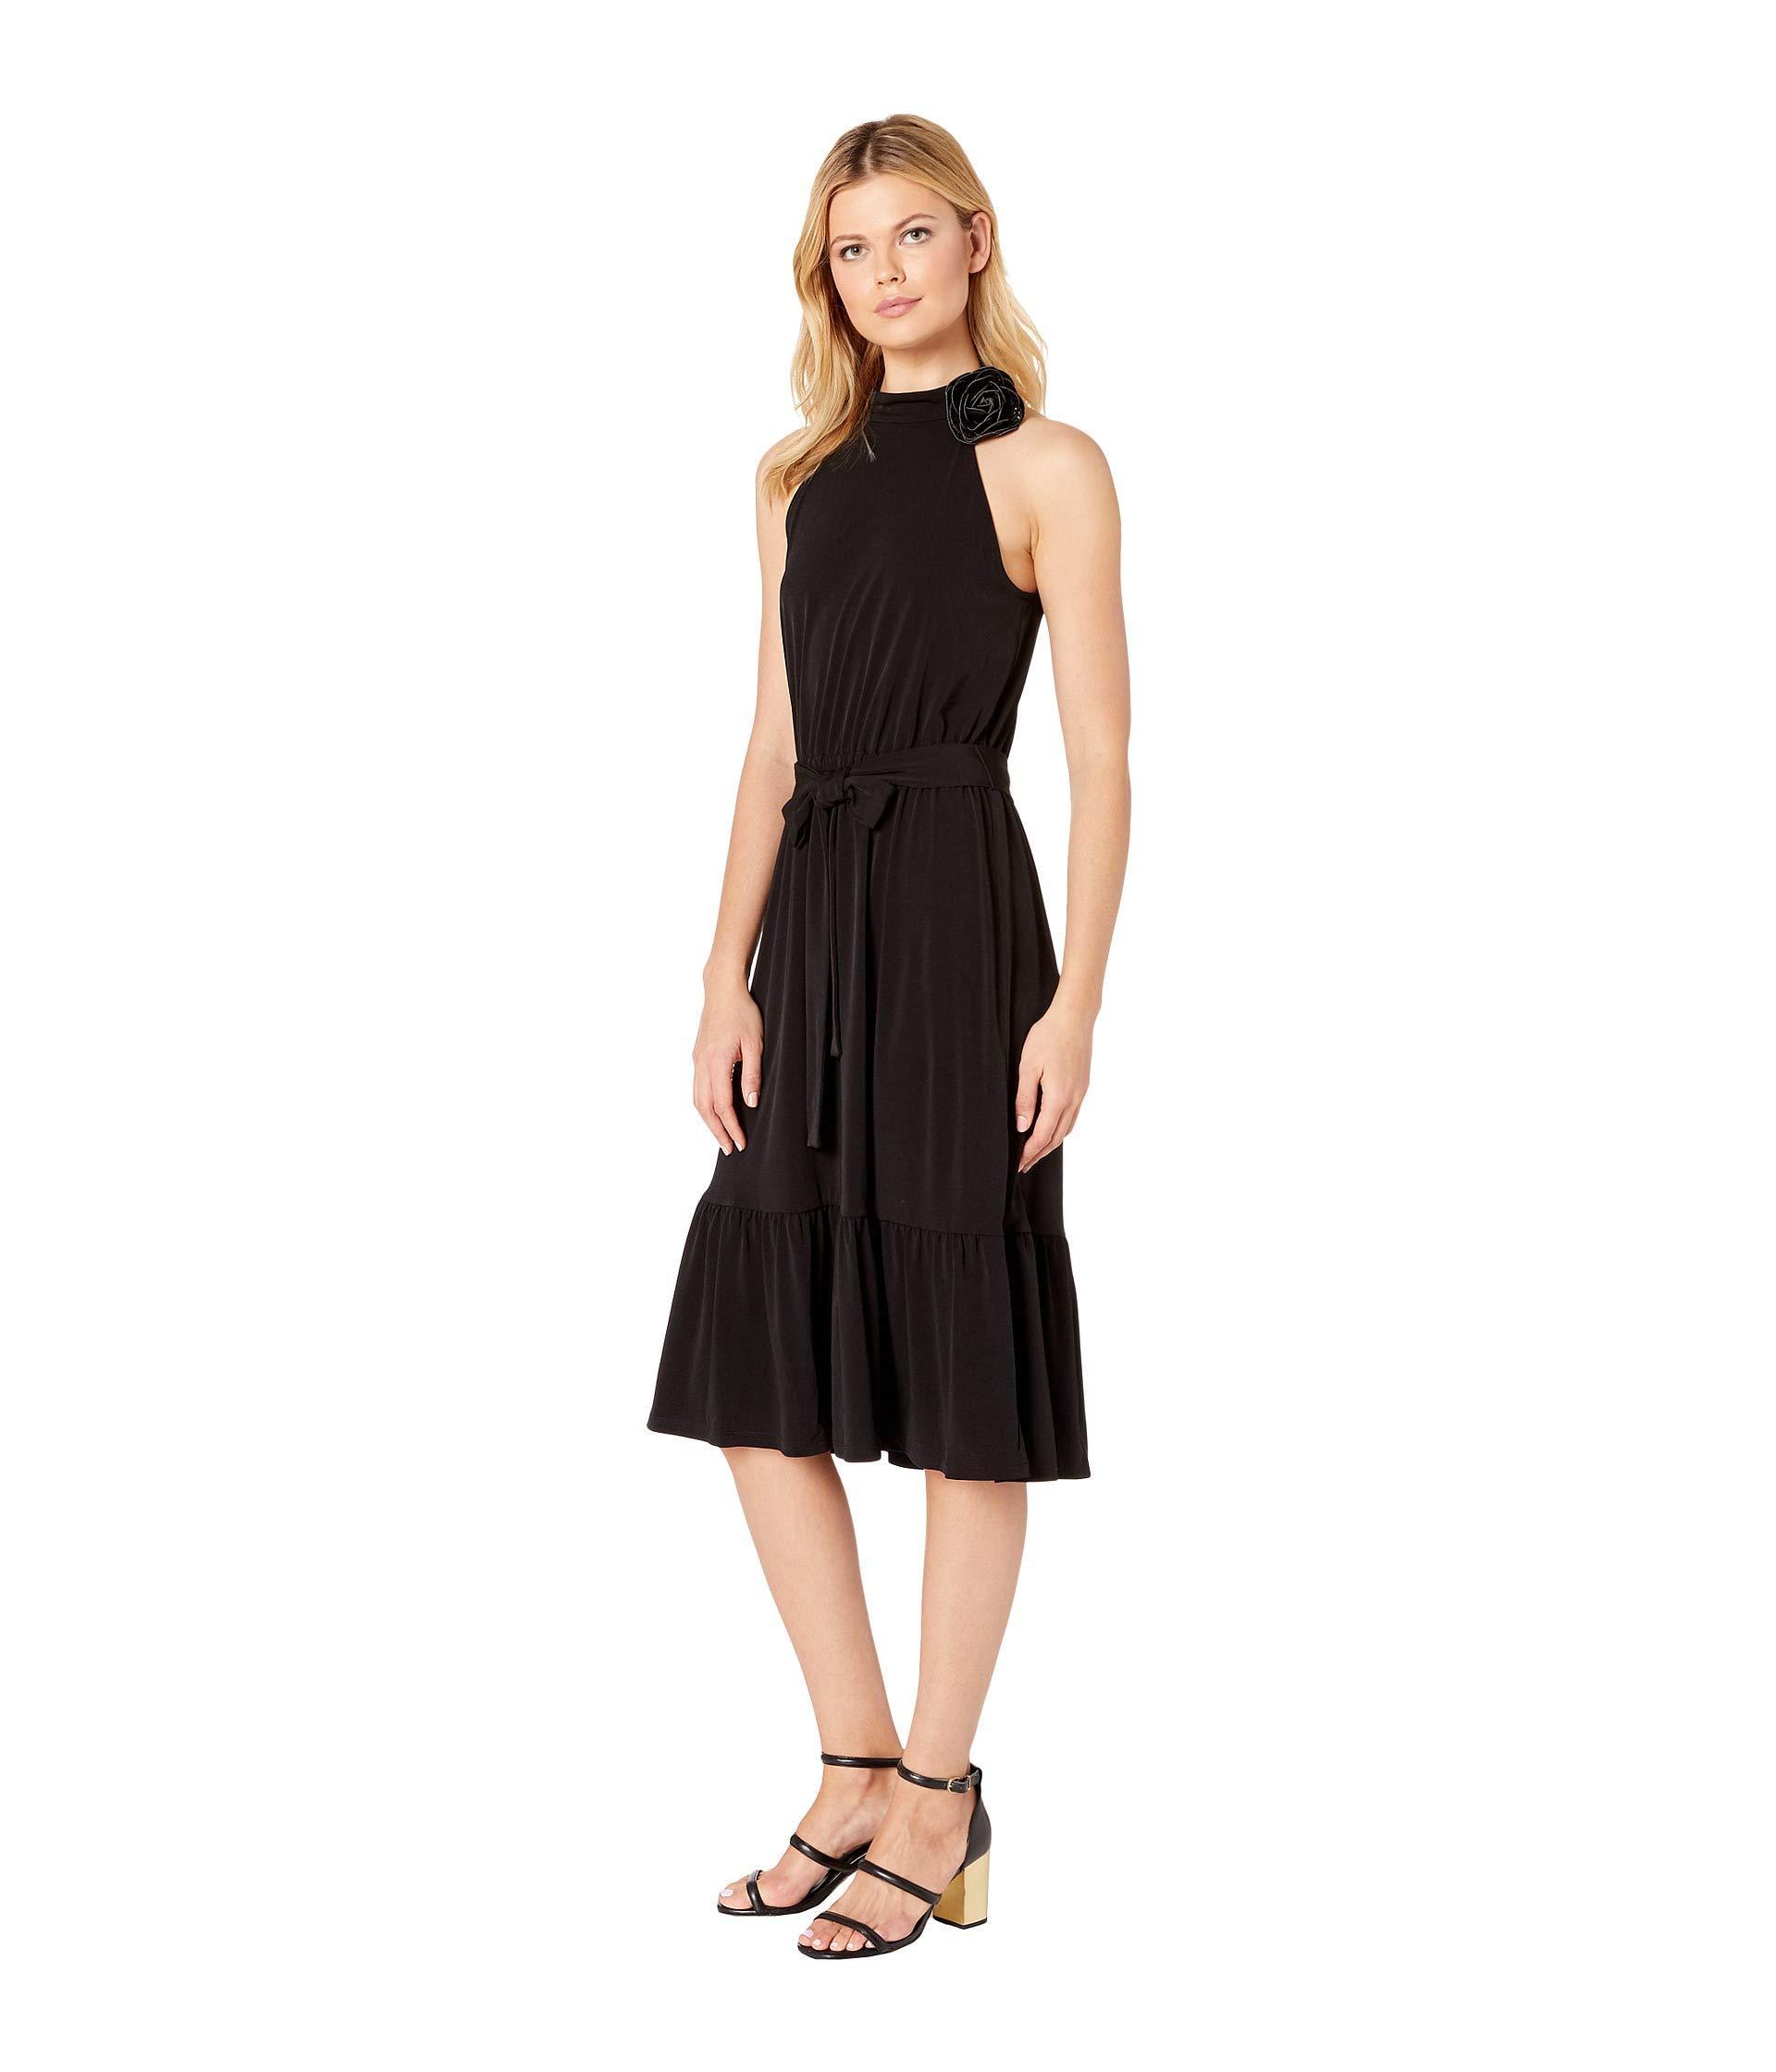 8ccfcd1a3b16 Lyst - MICHAEL Michael Kors Halter Neck Midi Dress in Black - Save 15%